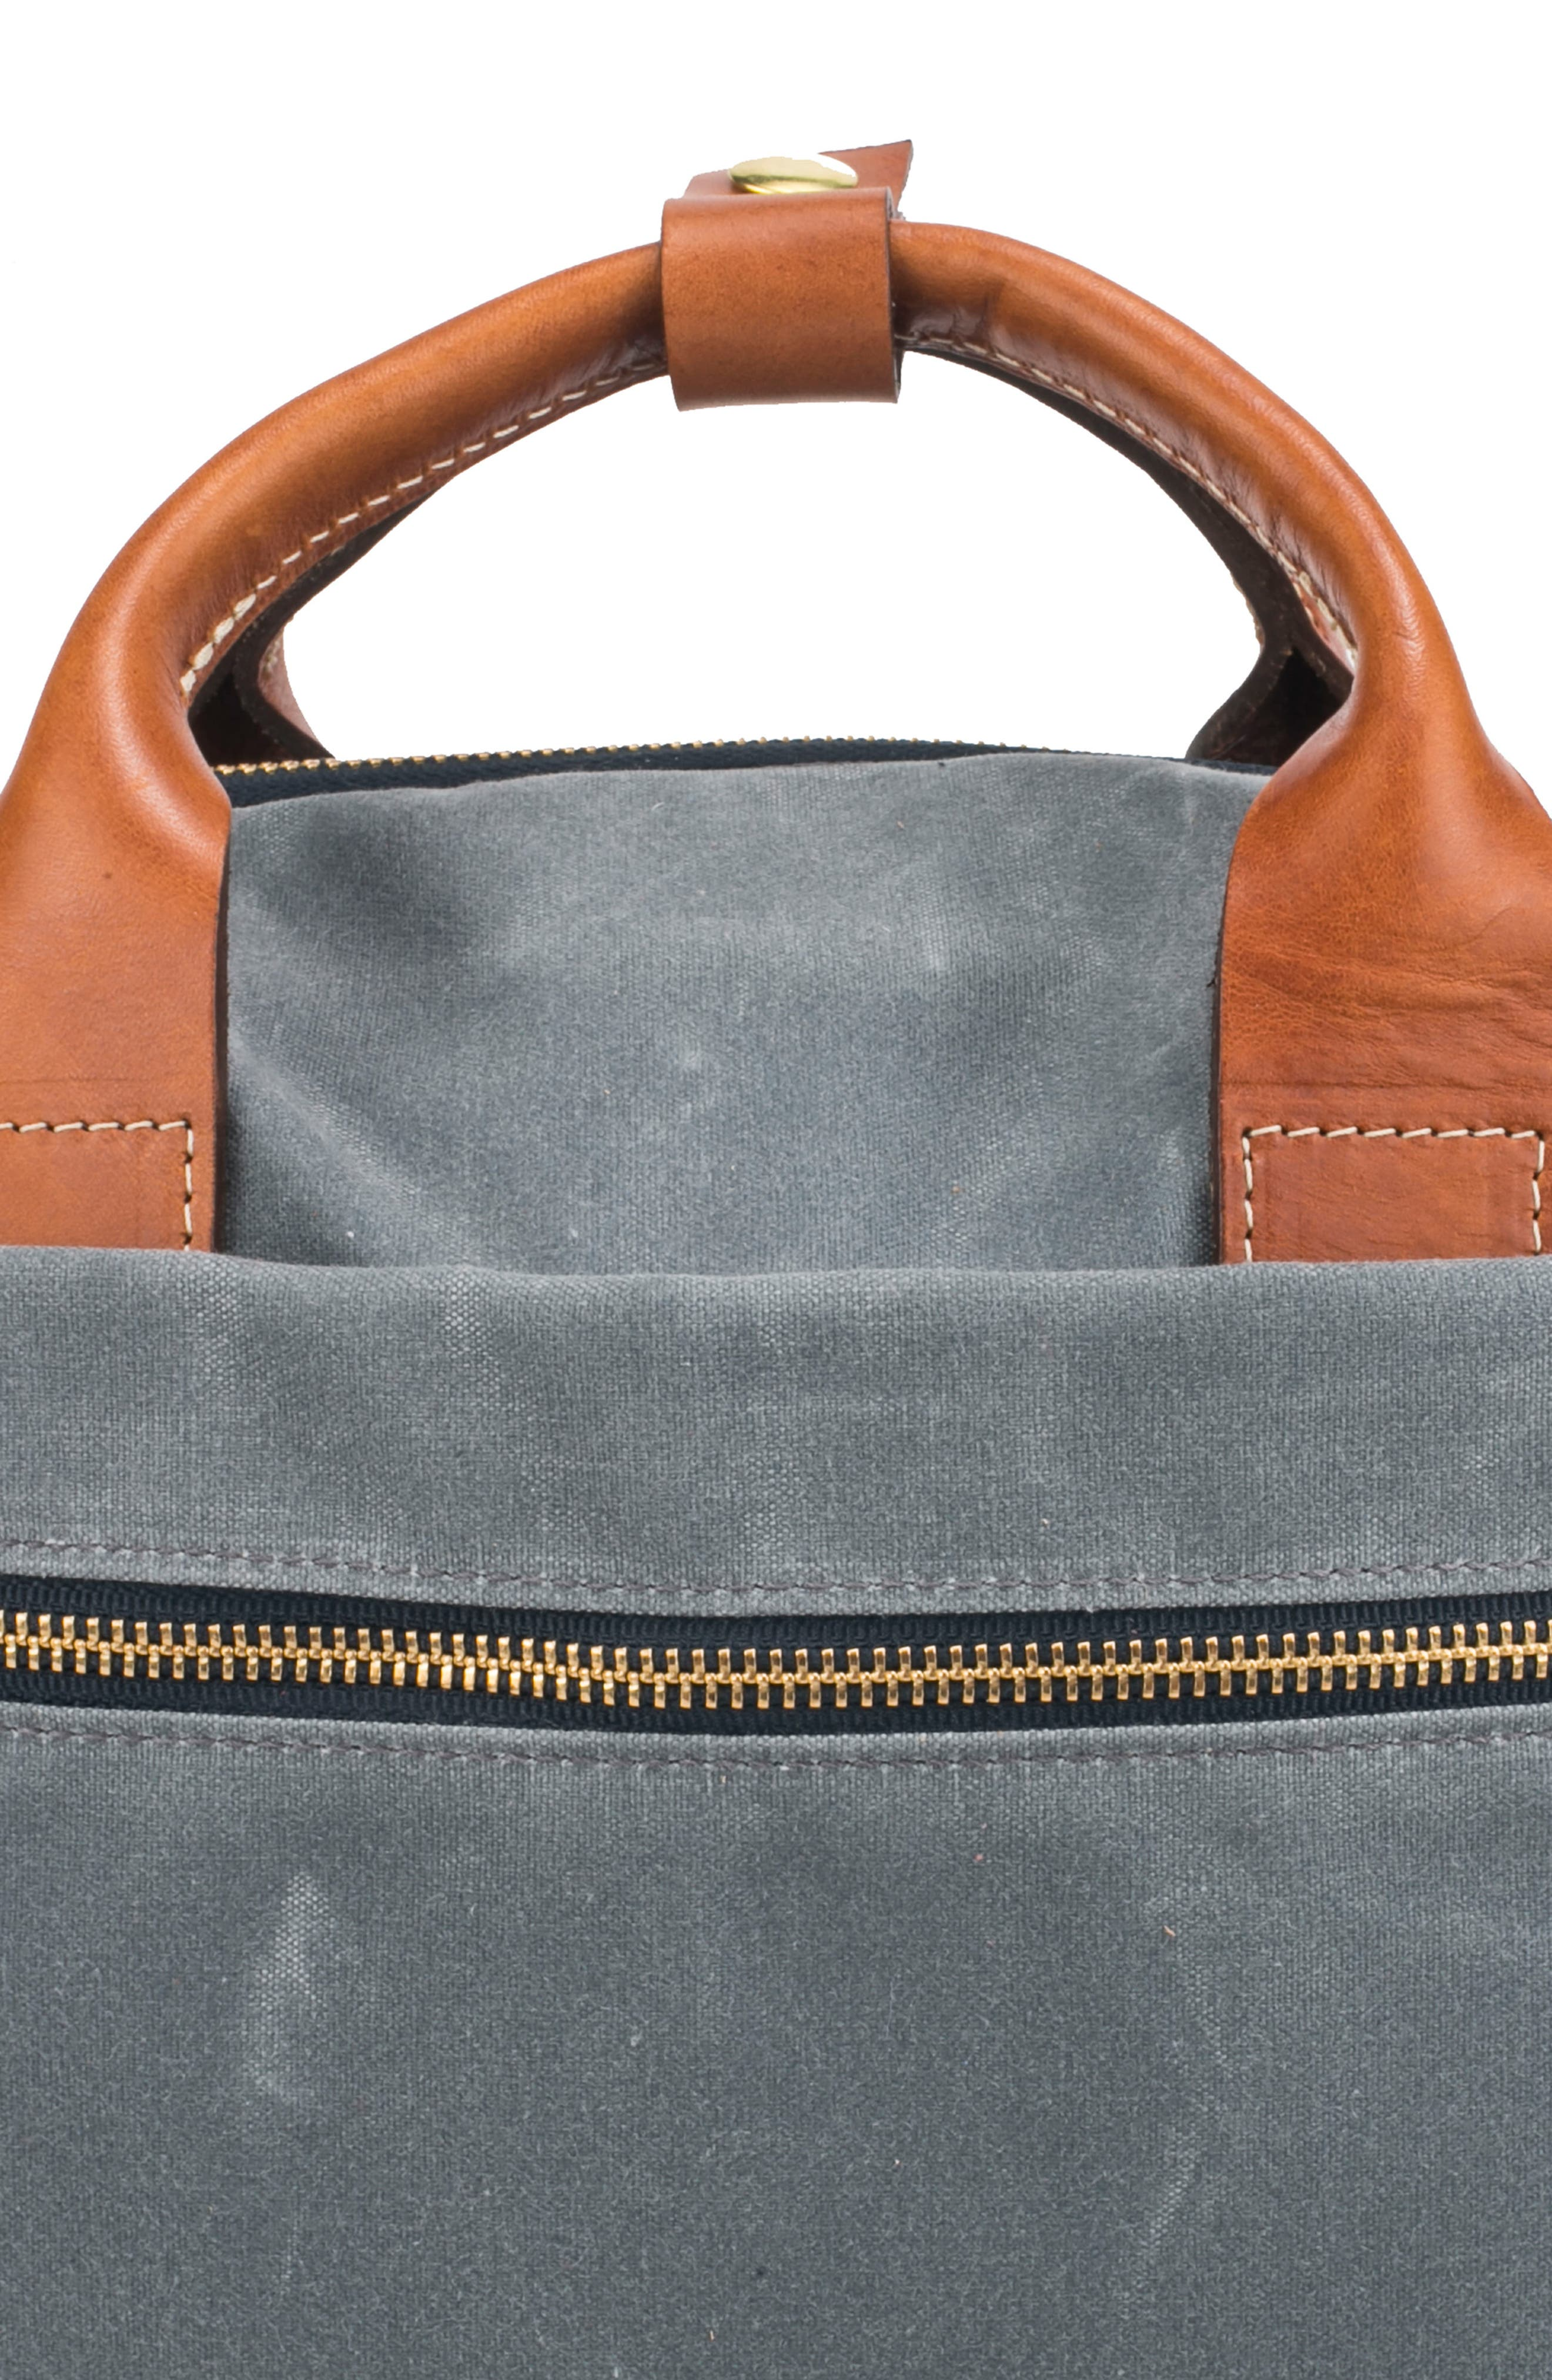 Metro Backpack,                             Alternate thumbnail 5, color,                             Charcoal